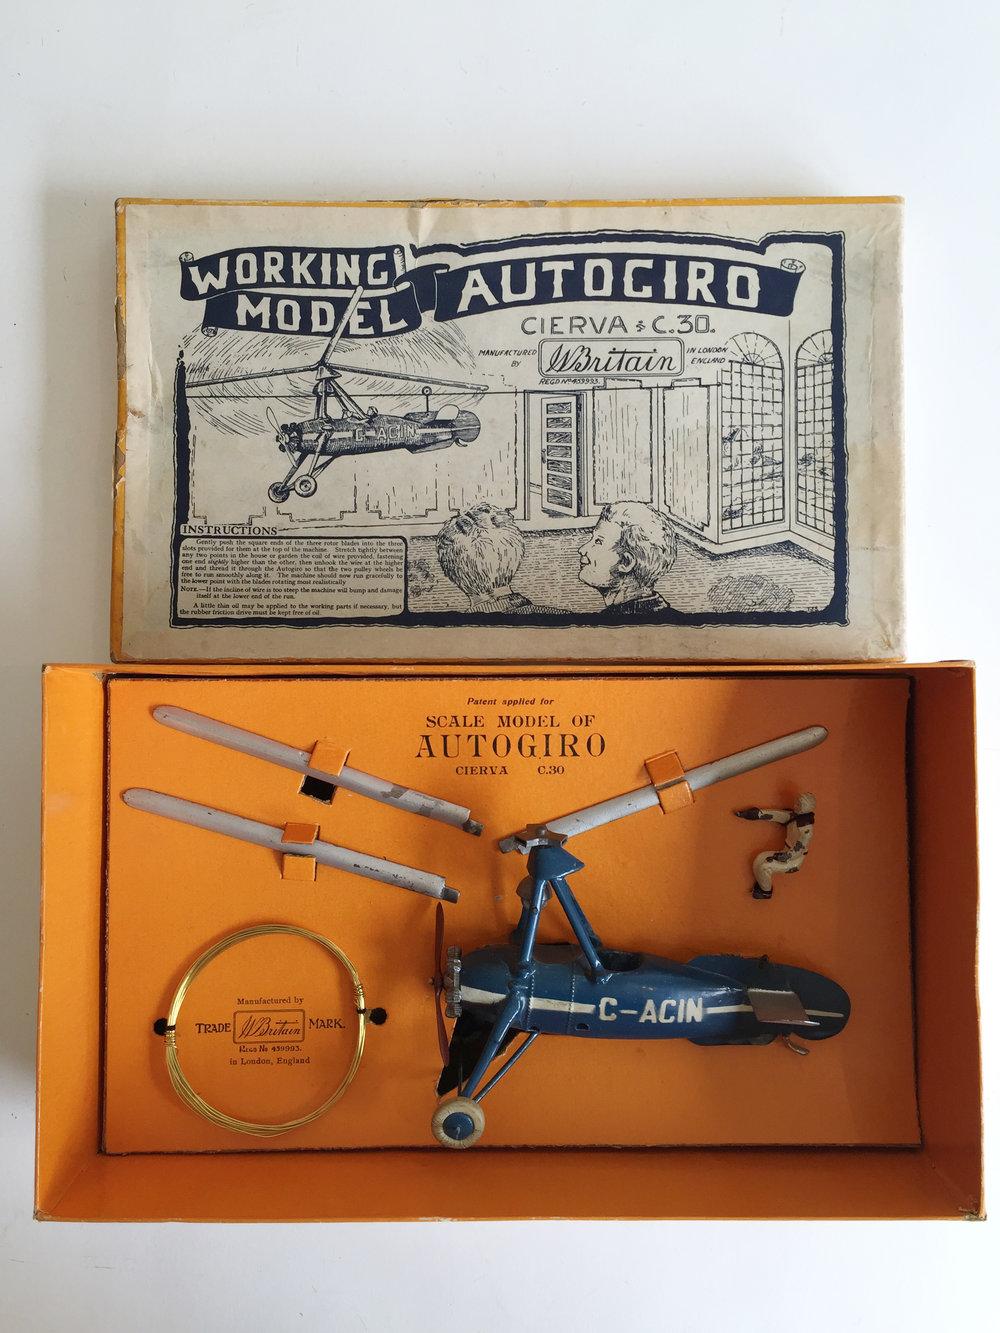 W. Birtain Set #1392 Civilian Autogiro